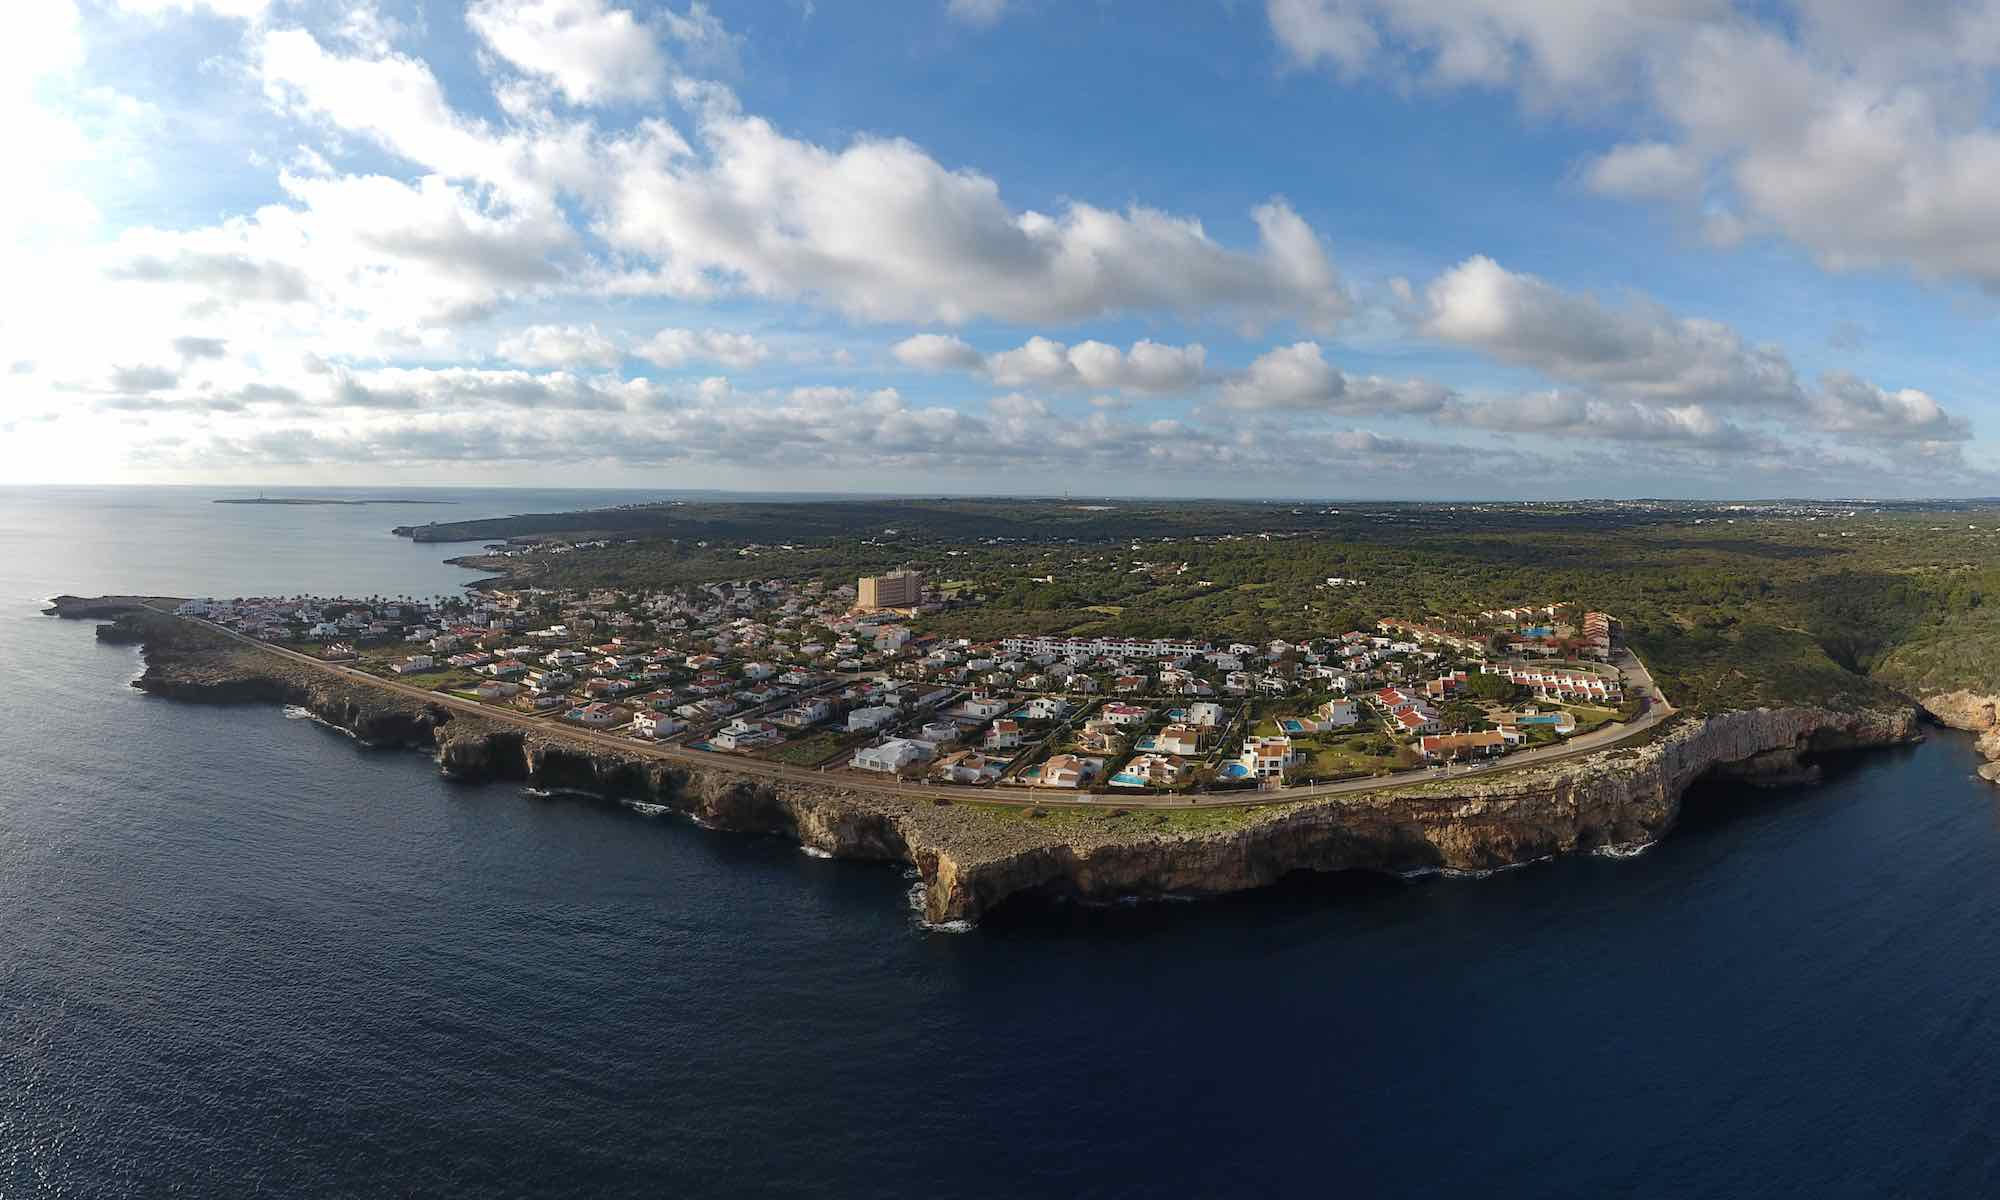 Aerial view of S'Algar in Menorca   #1 For Scuba Diving, PADI Courses & Snorkelling Excursions.